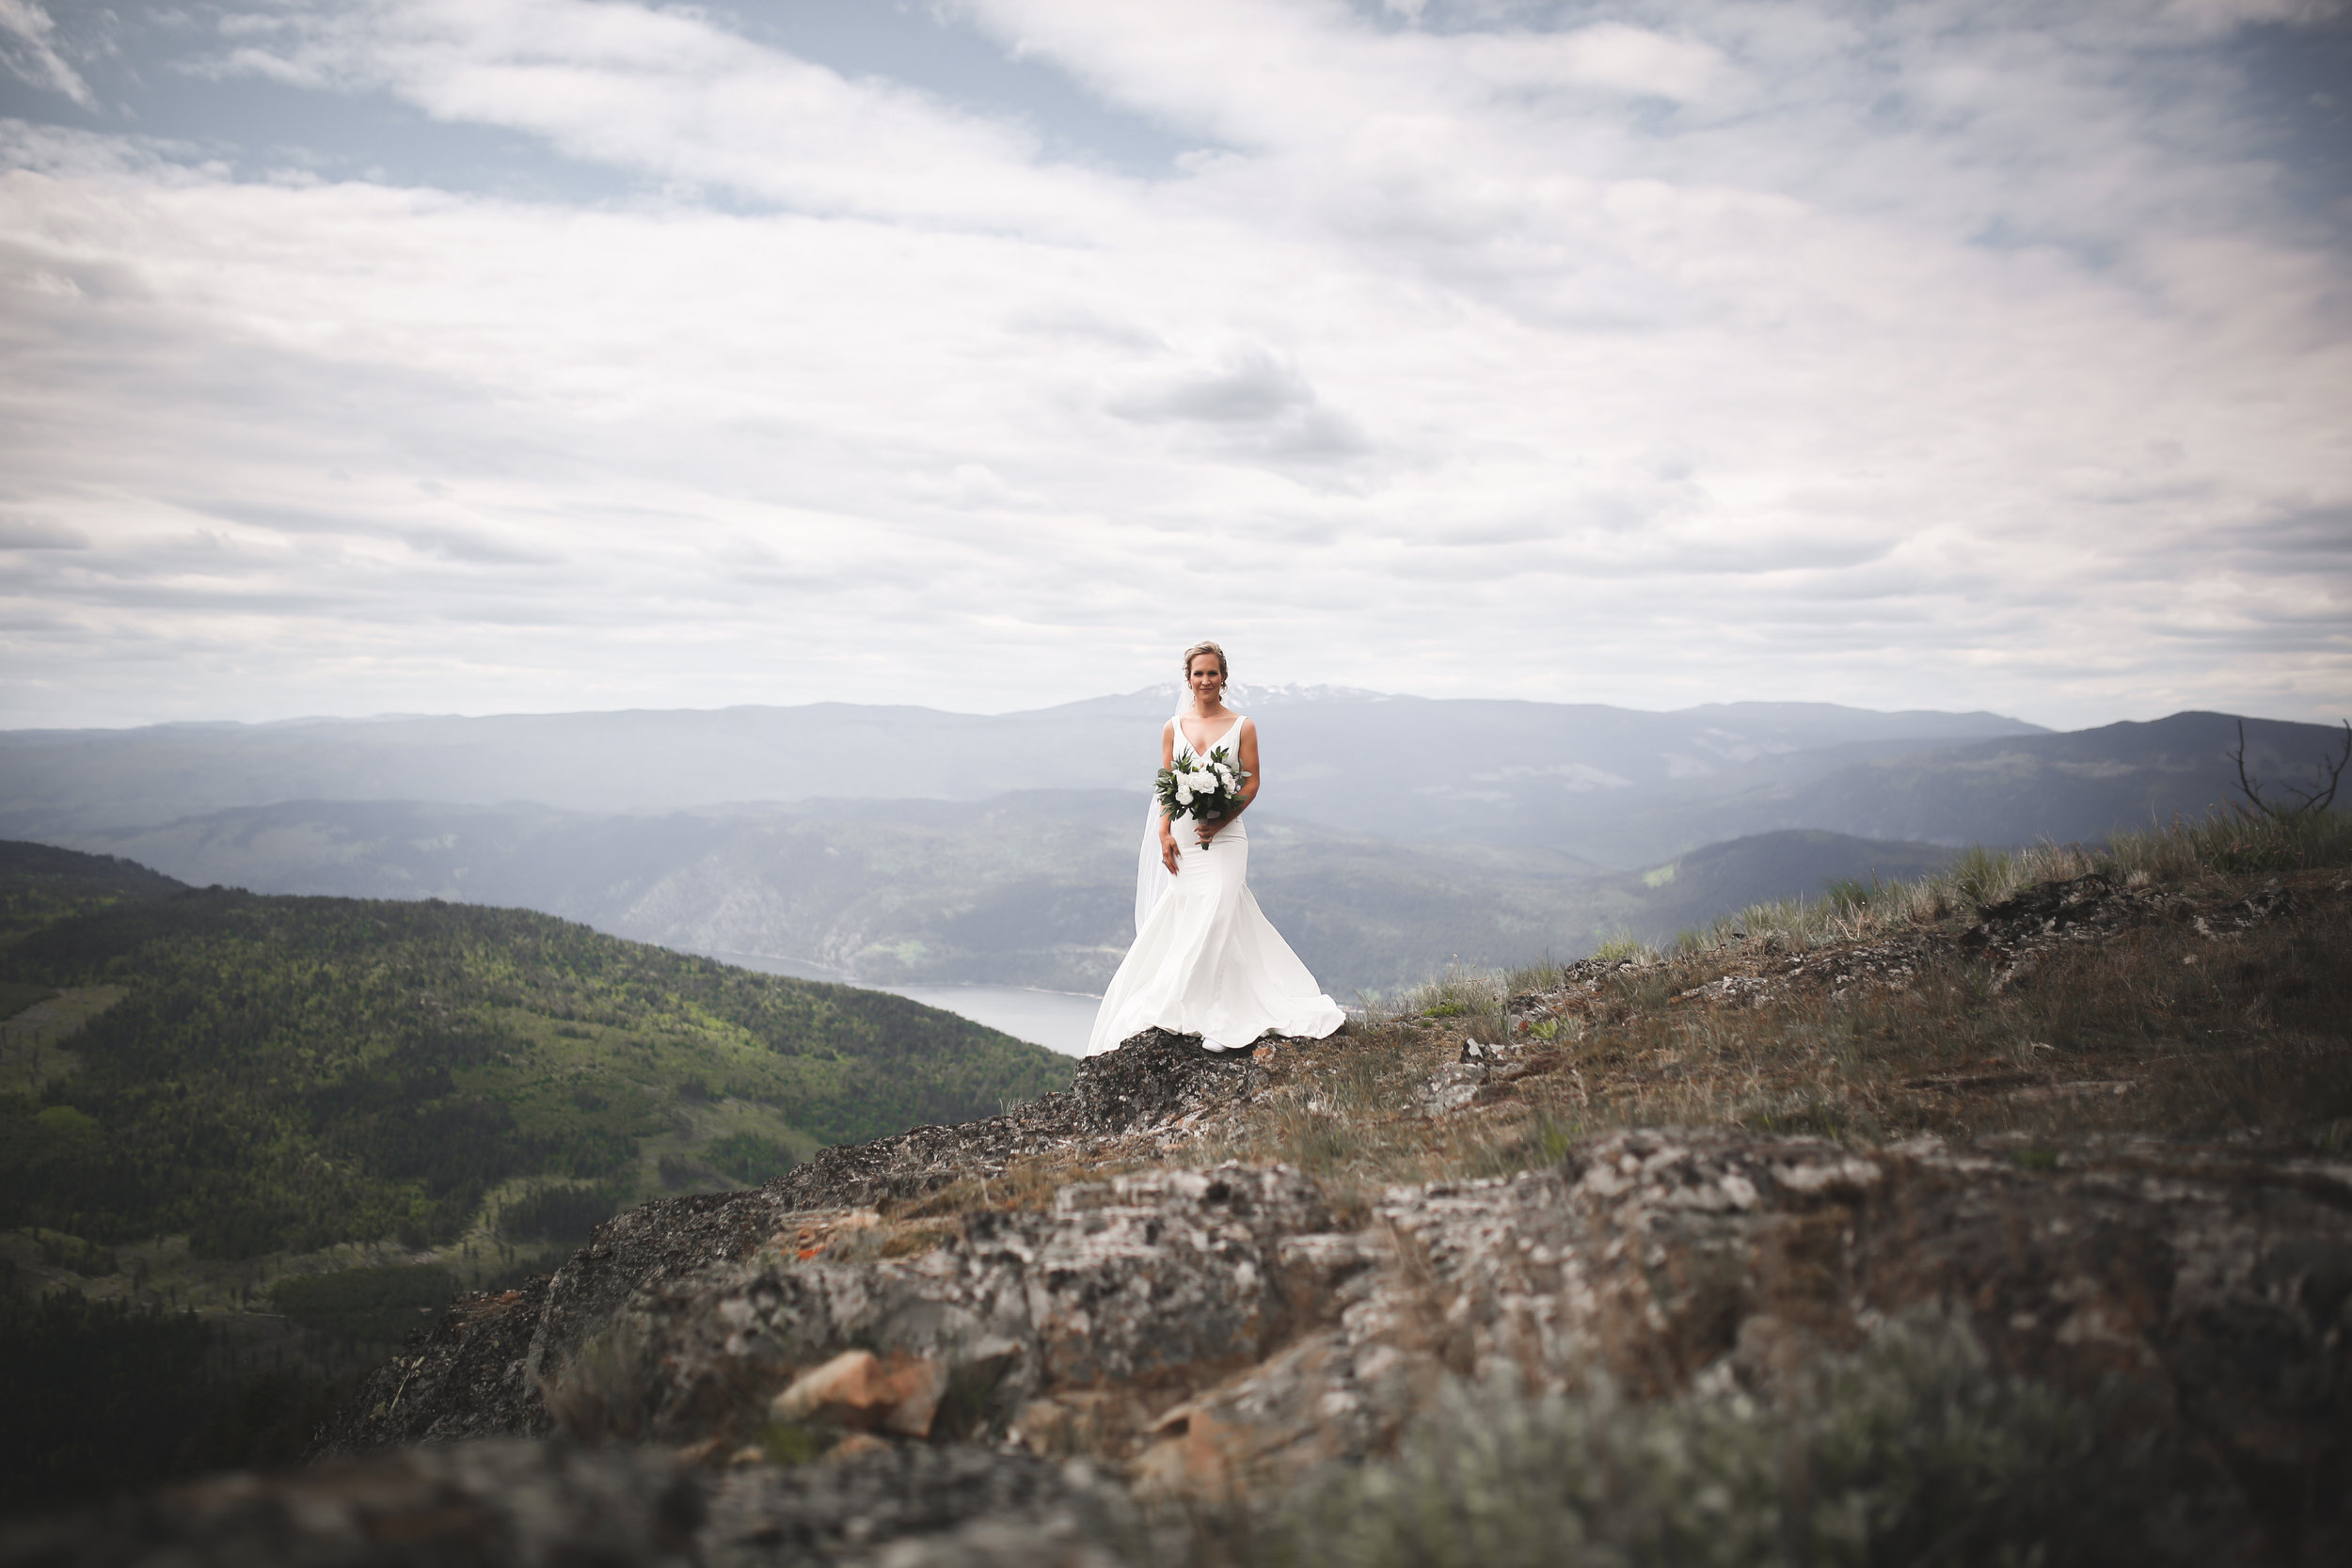 161 Adam Ziorio Photography - Kate & Ben's Wedding.jpg